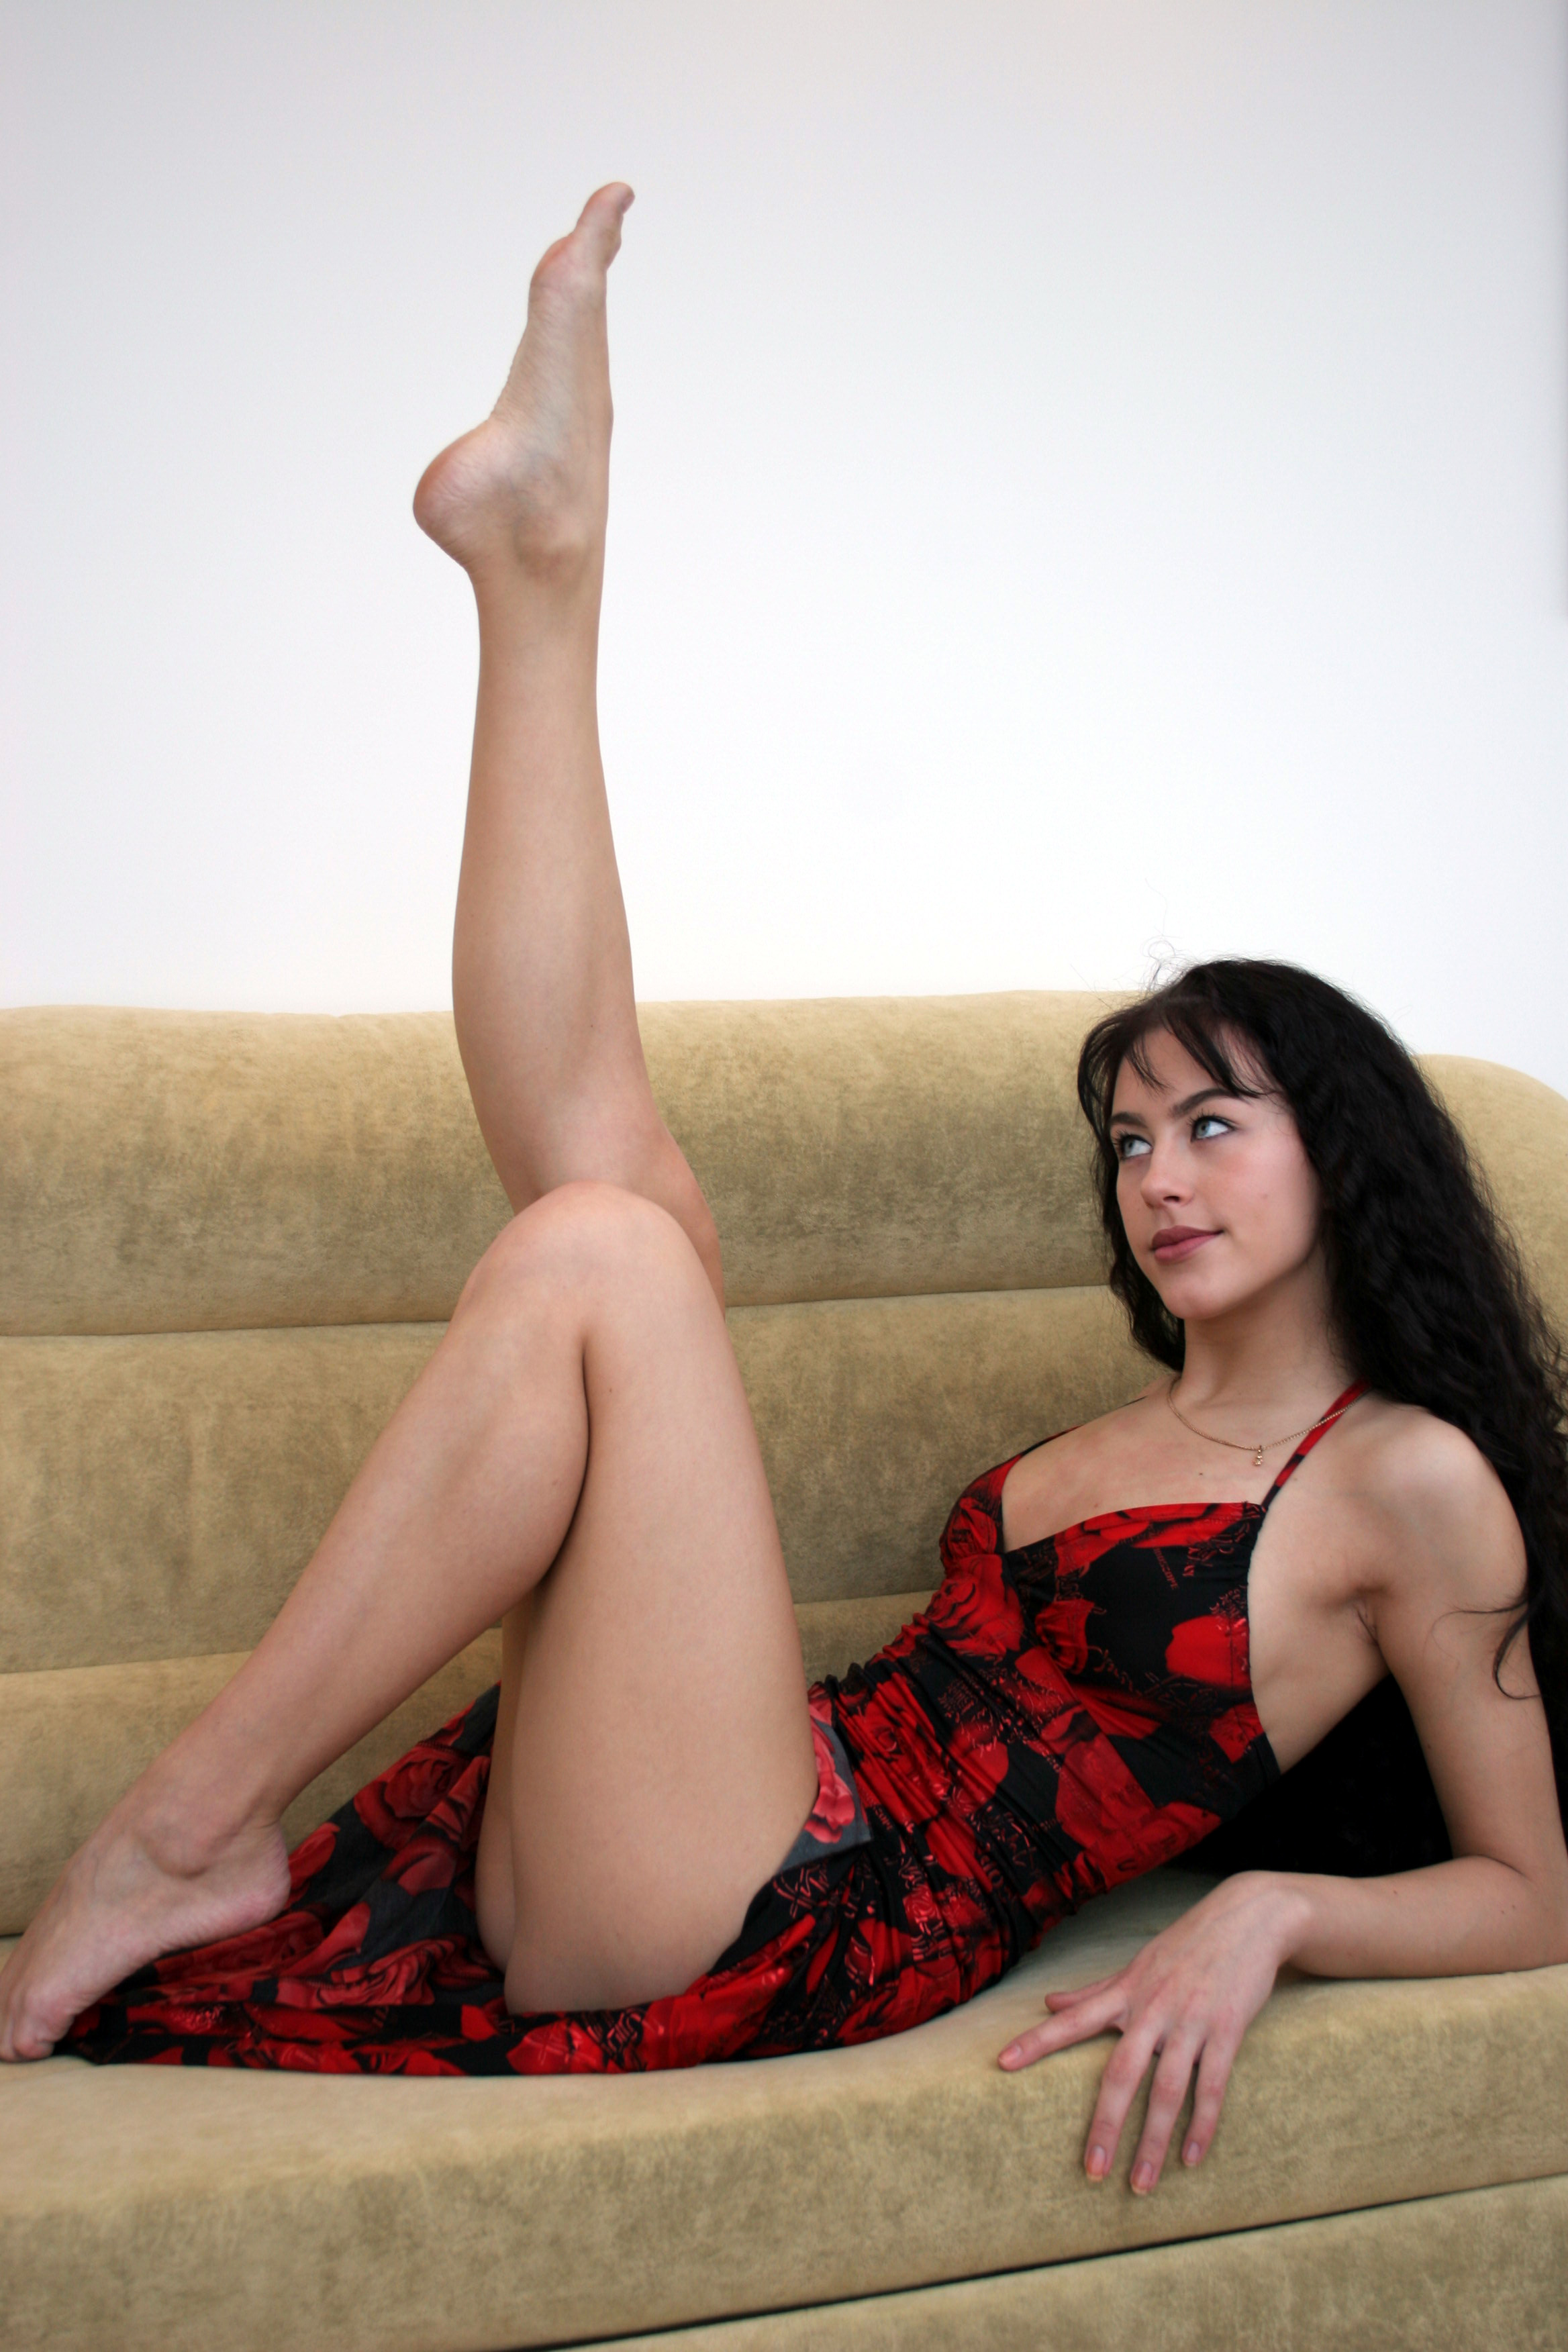 seks-znakomstva-v-polshe